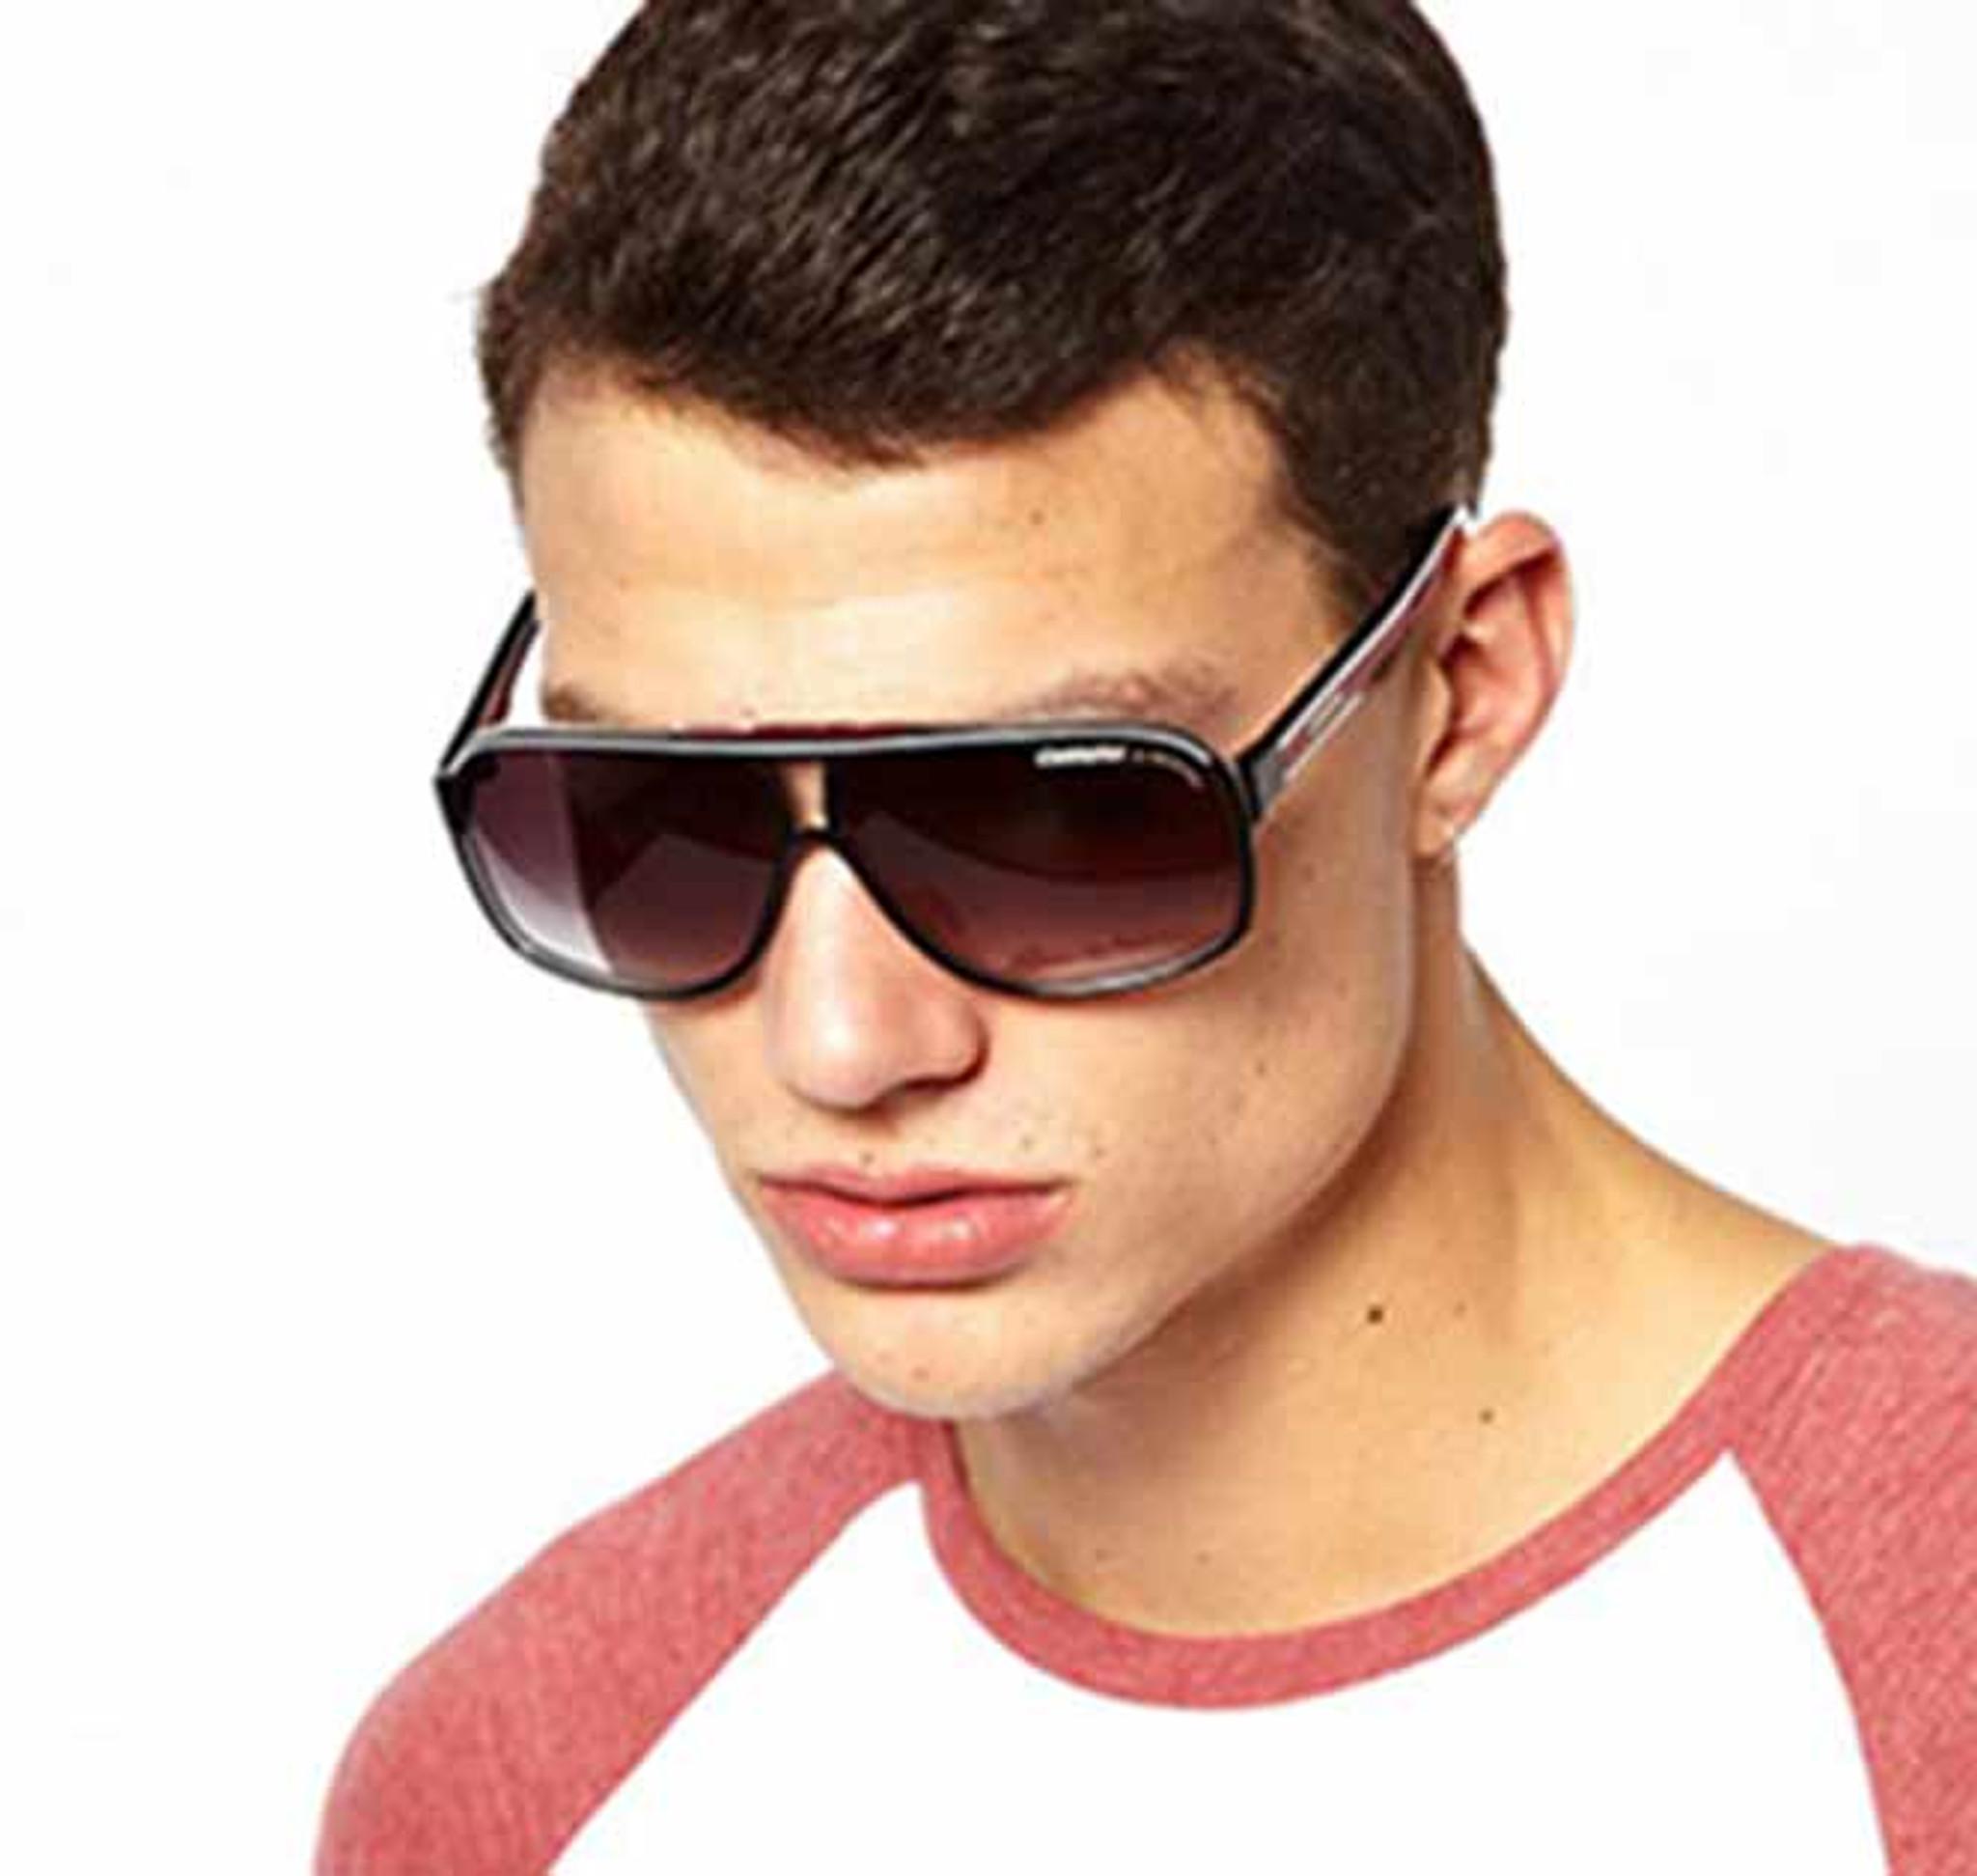 New CARRERA Square Aviator Sunglasses Mens Women Oversized Outdoor Shade Glasses